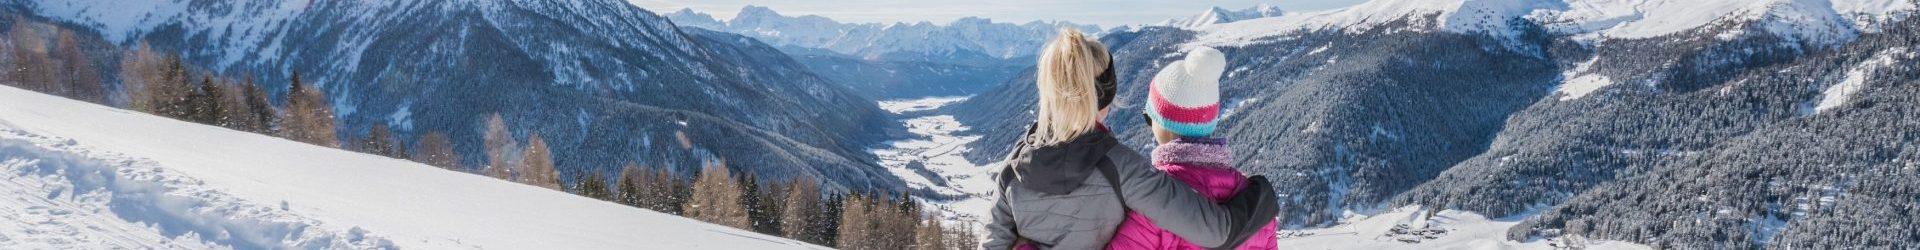 Winterdagen met Green SPA, Eco Farm en pure privacy in Zuid-Tirol